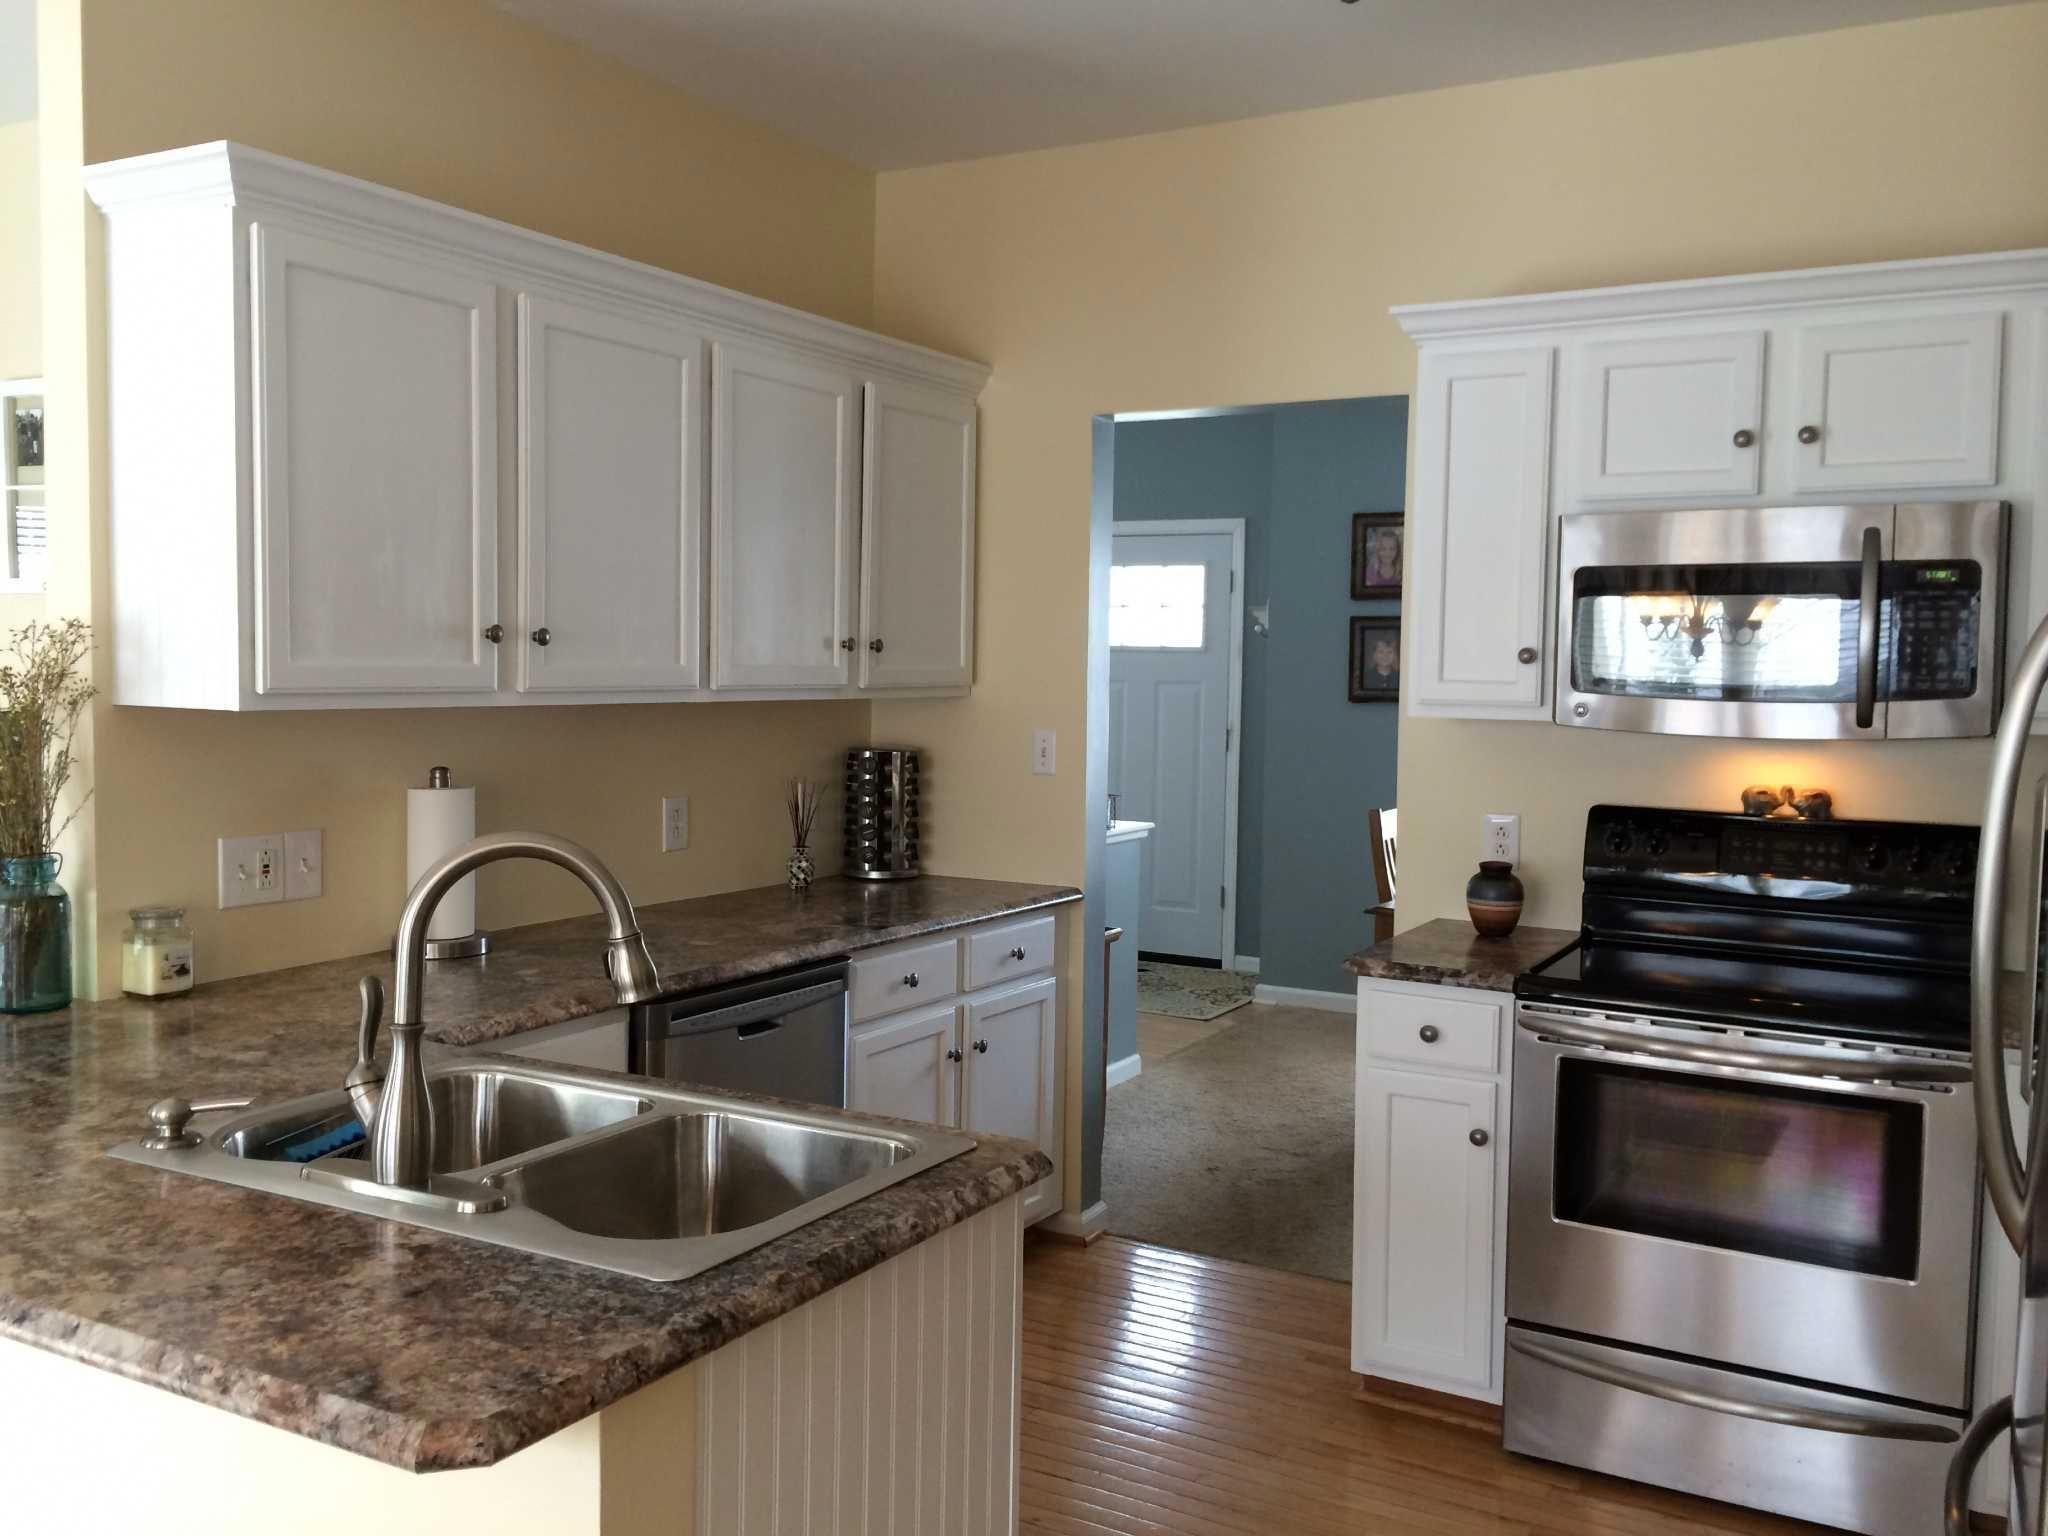 Beautiful Painted Case Concepts & Ideas regarding kitchen ...